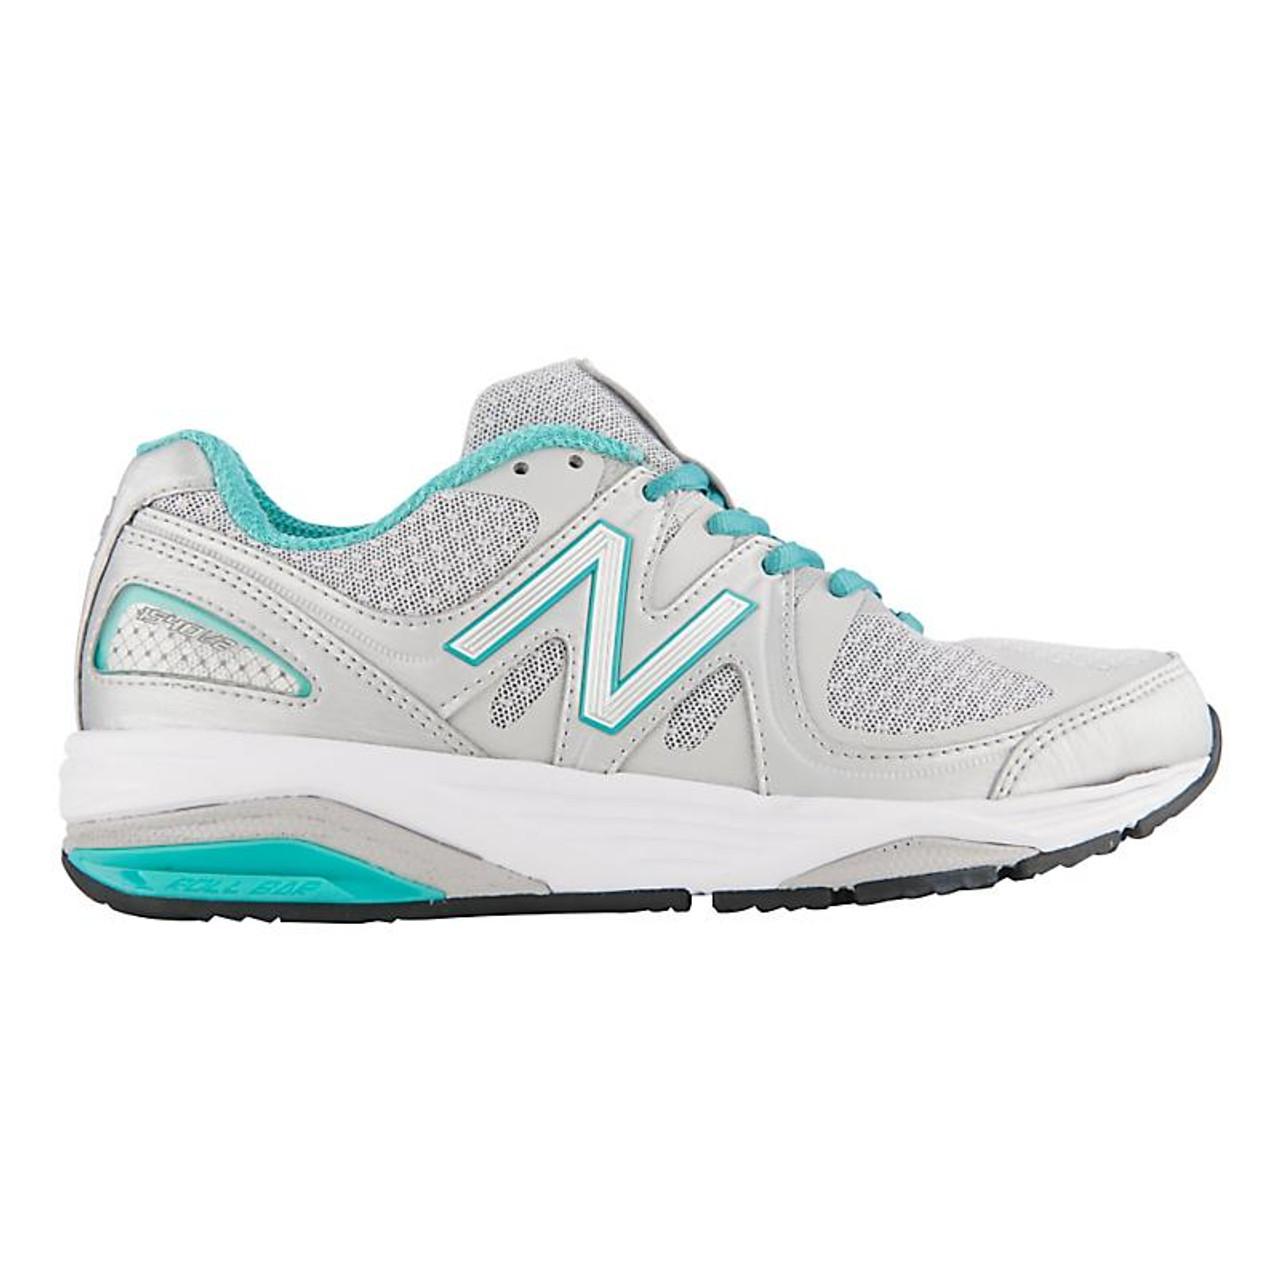 Women's New Balance 1540v2 Running Shoe